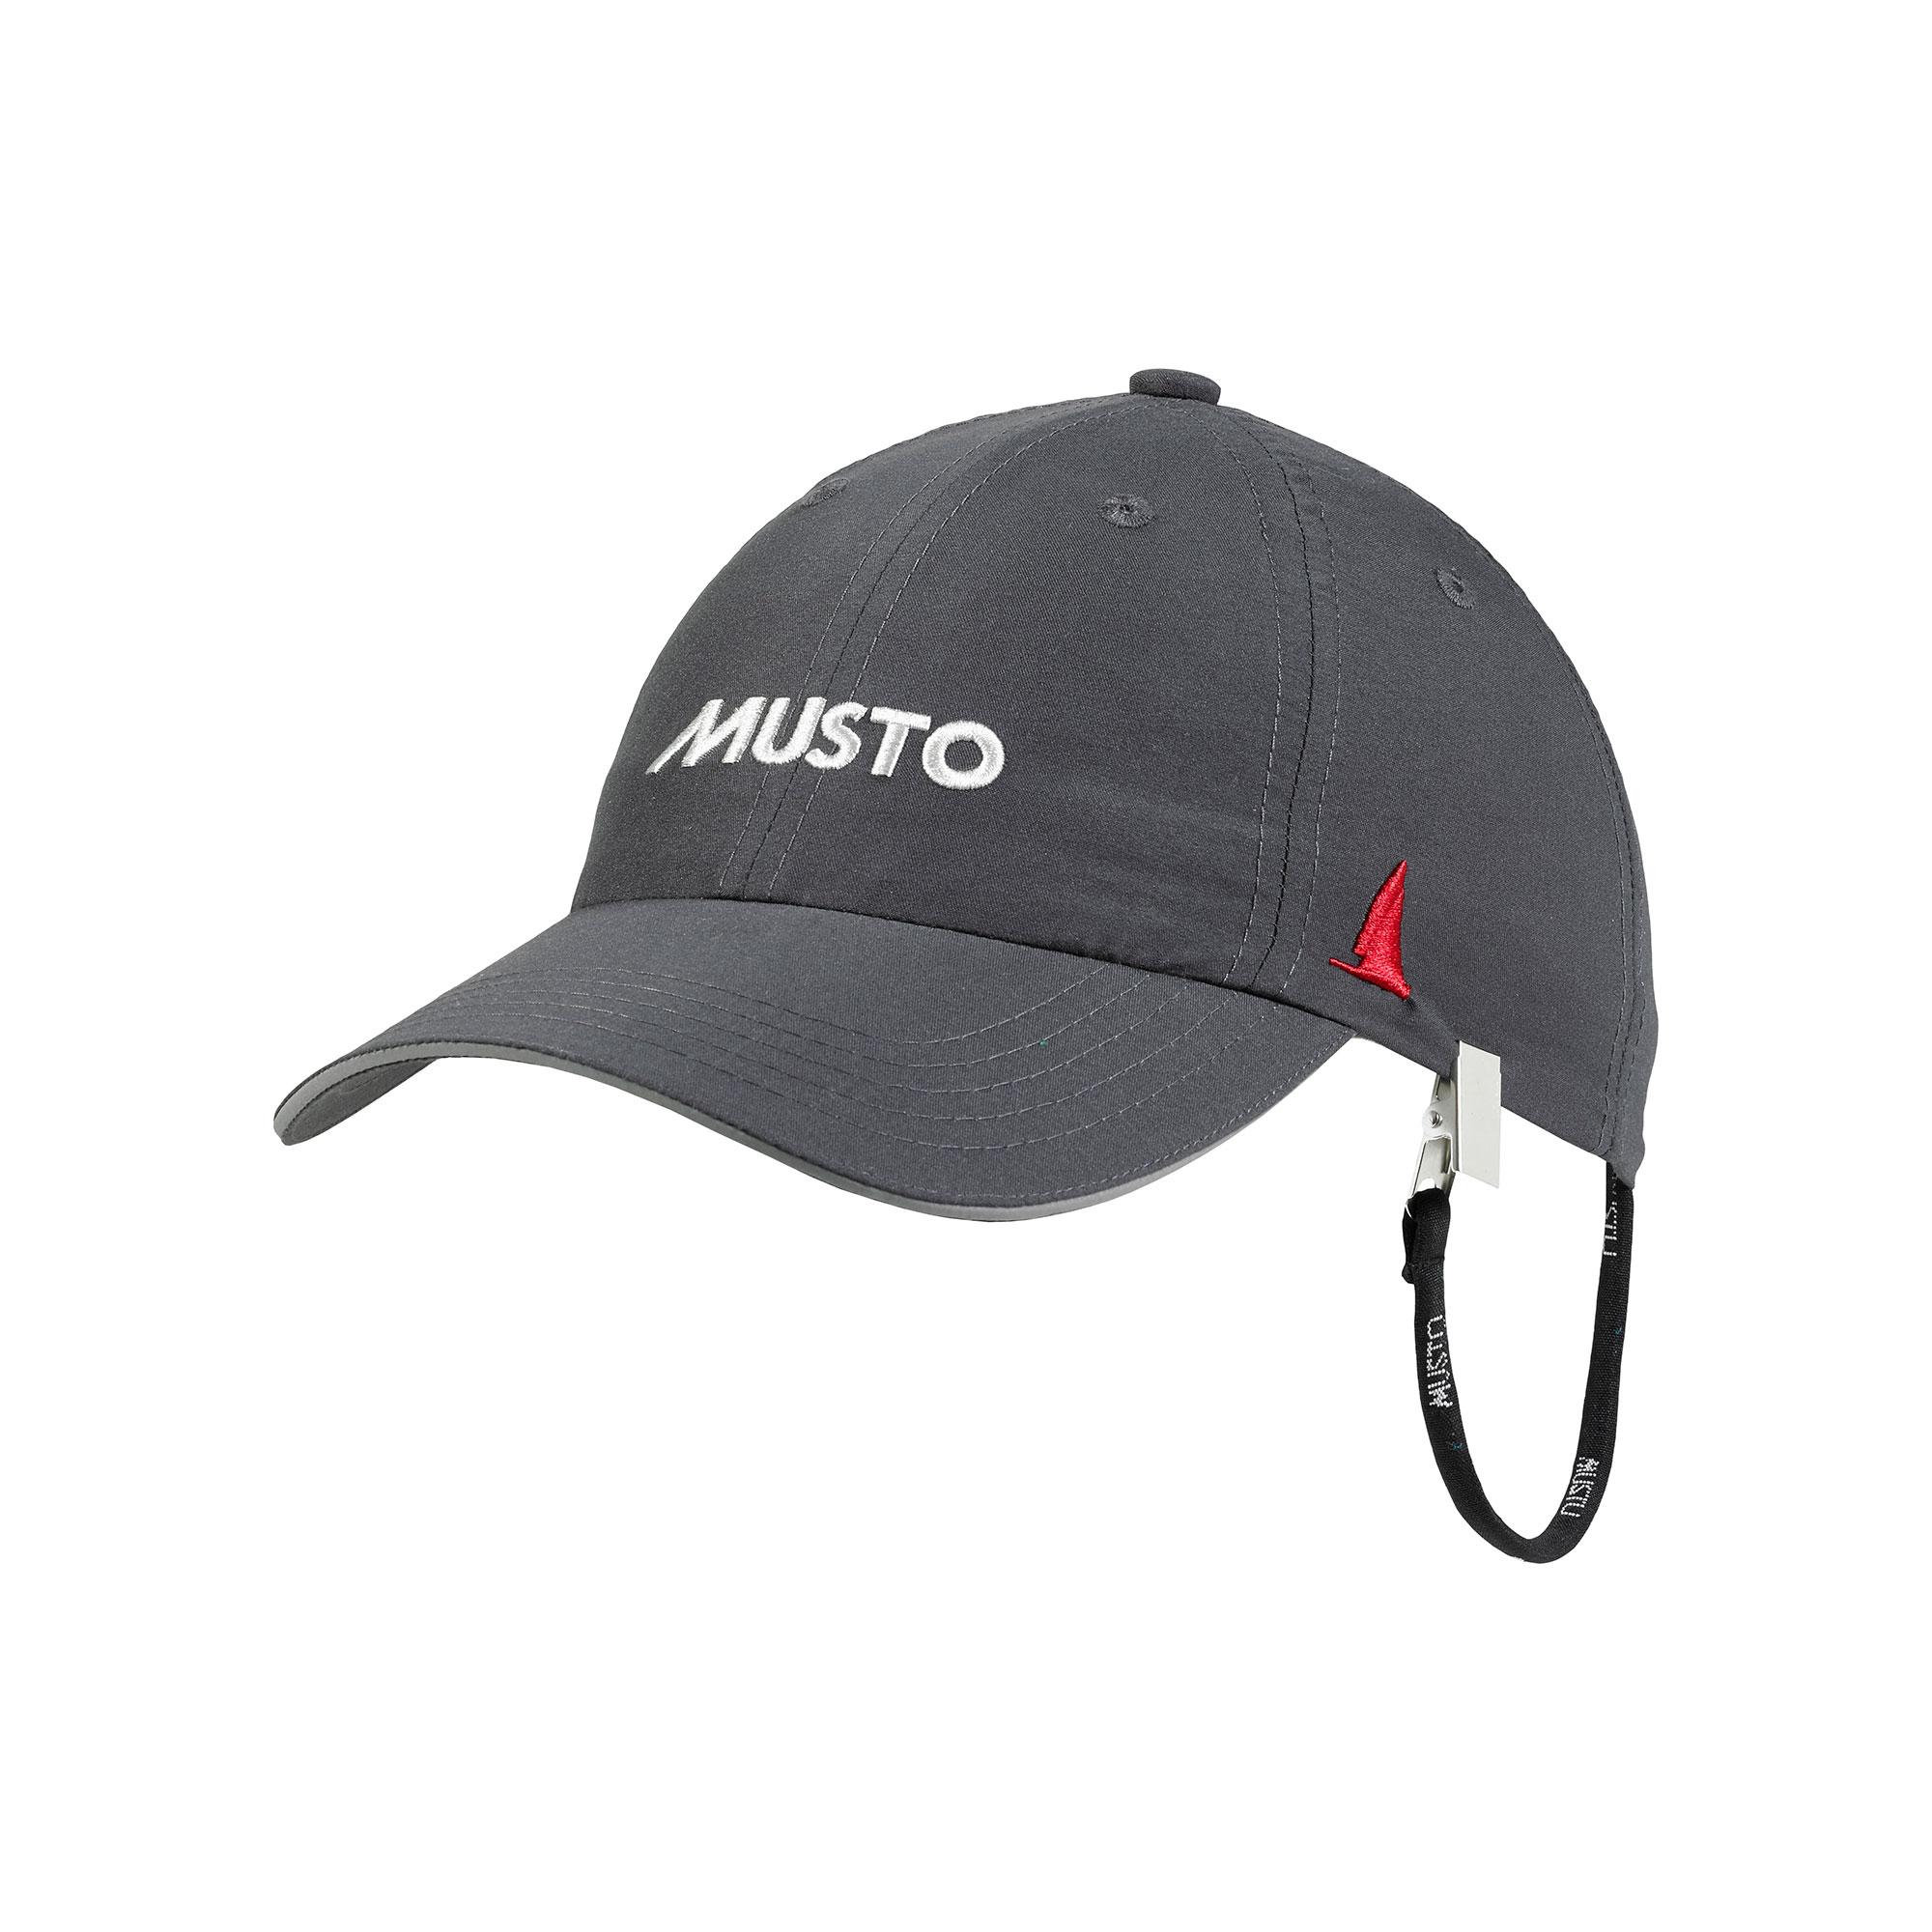 Musto Essential UV Fast Dry Crew cap Charcoal